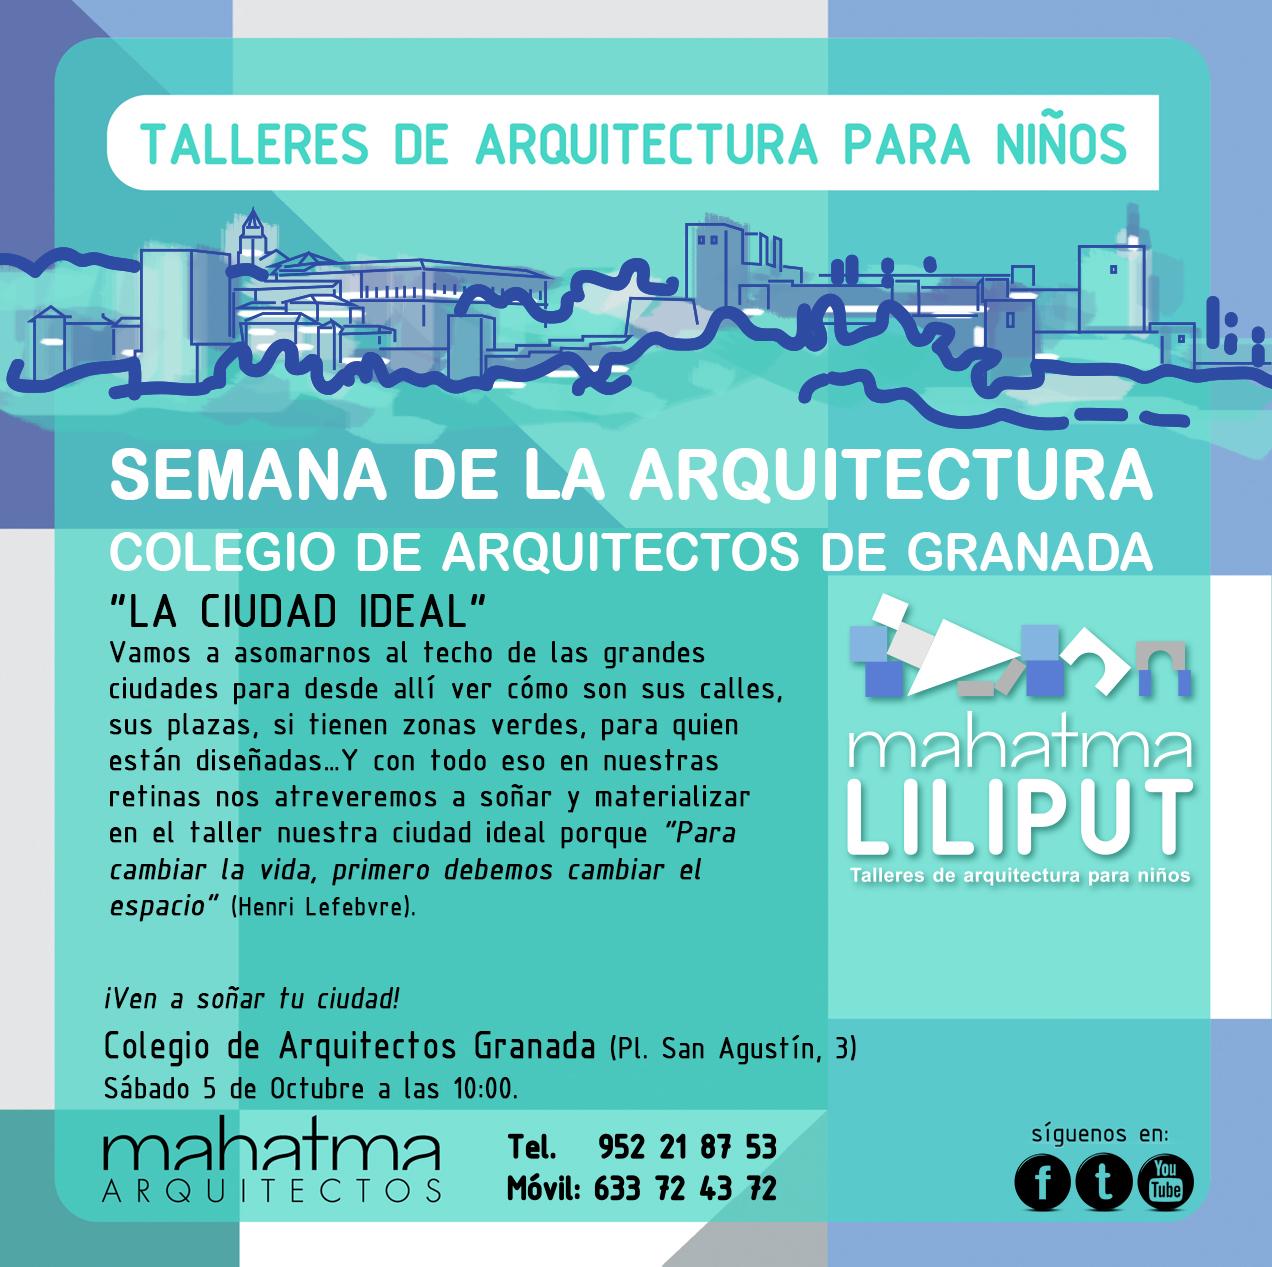 Semana de la arquitectura 2013 mahatma arquitectos blog - Arquitectos de granada ...